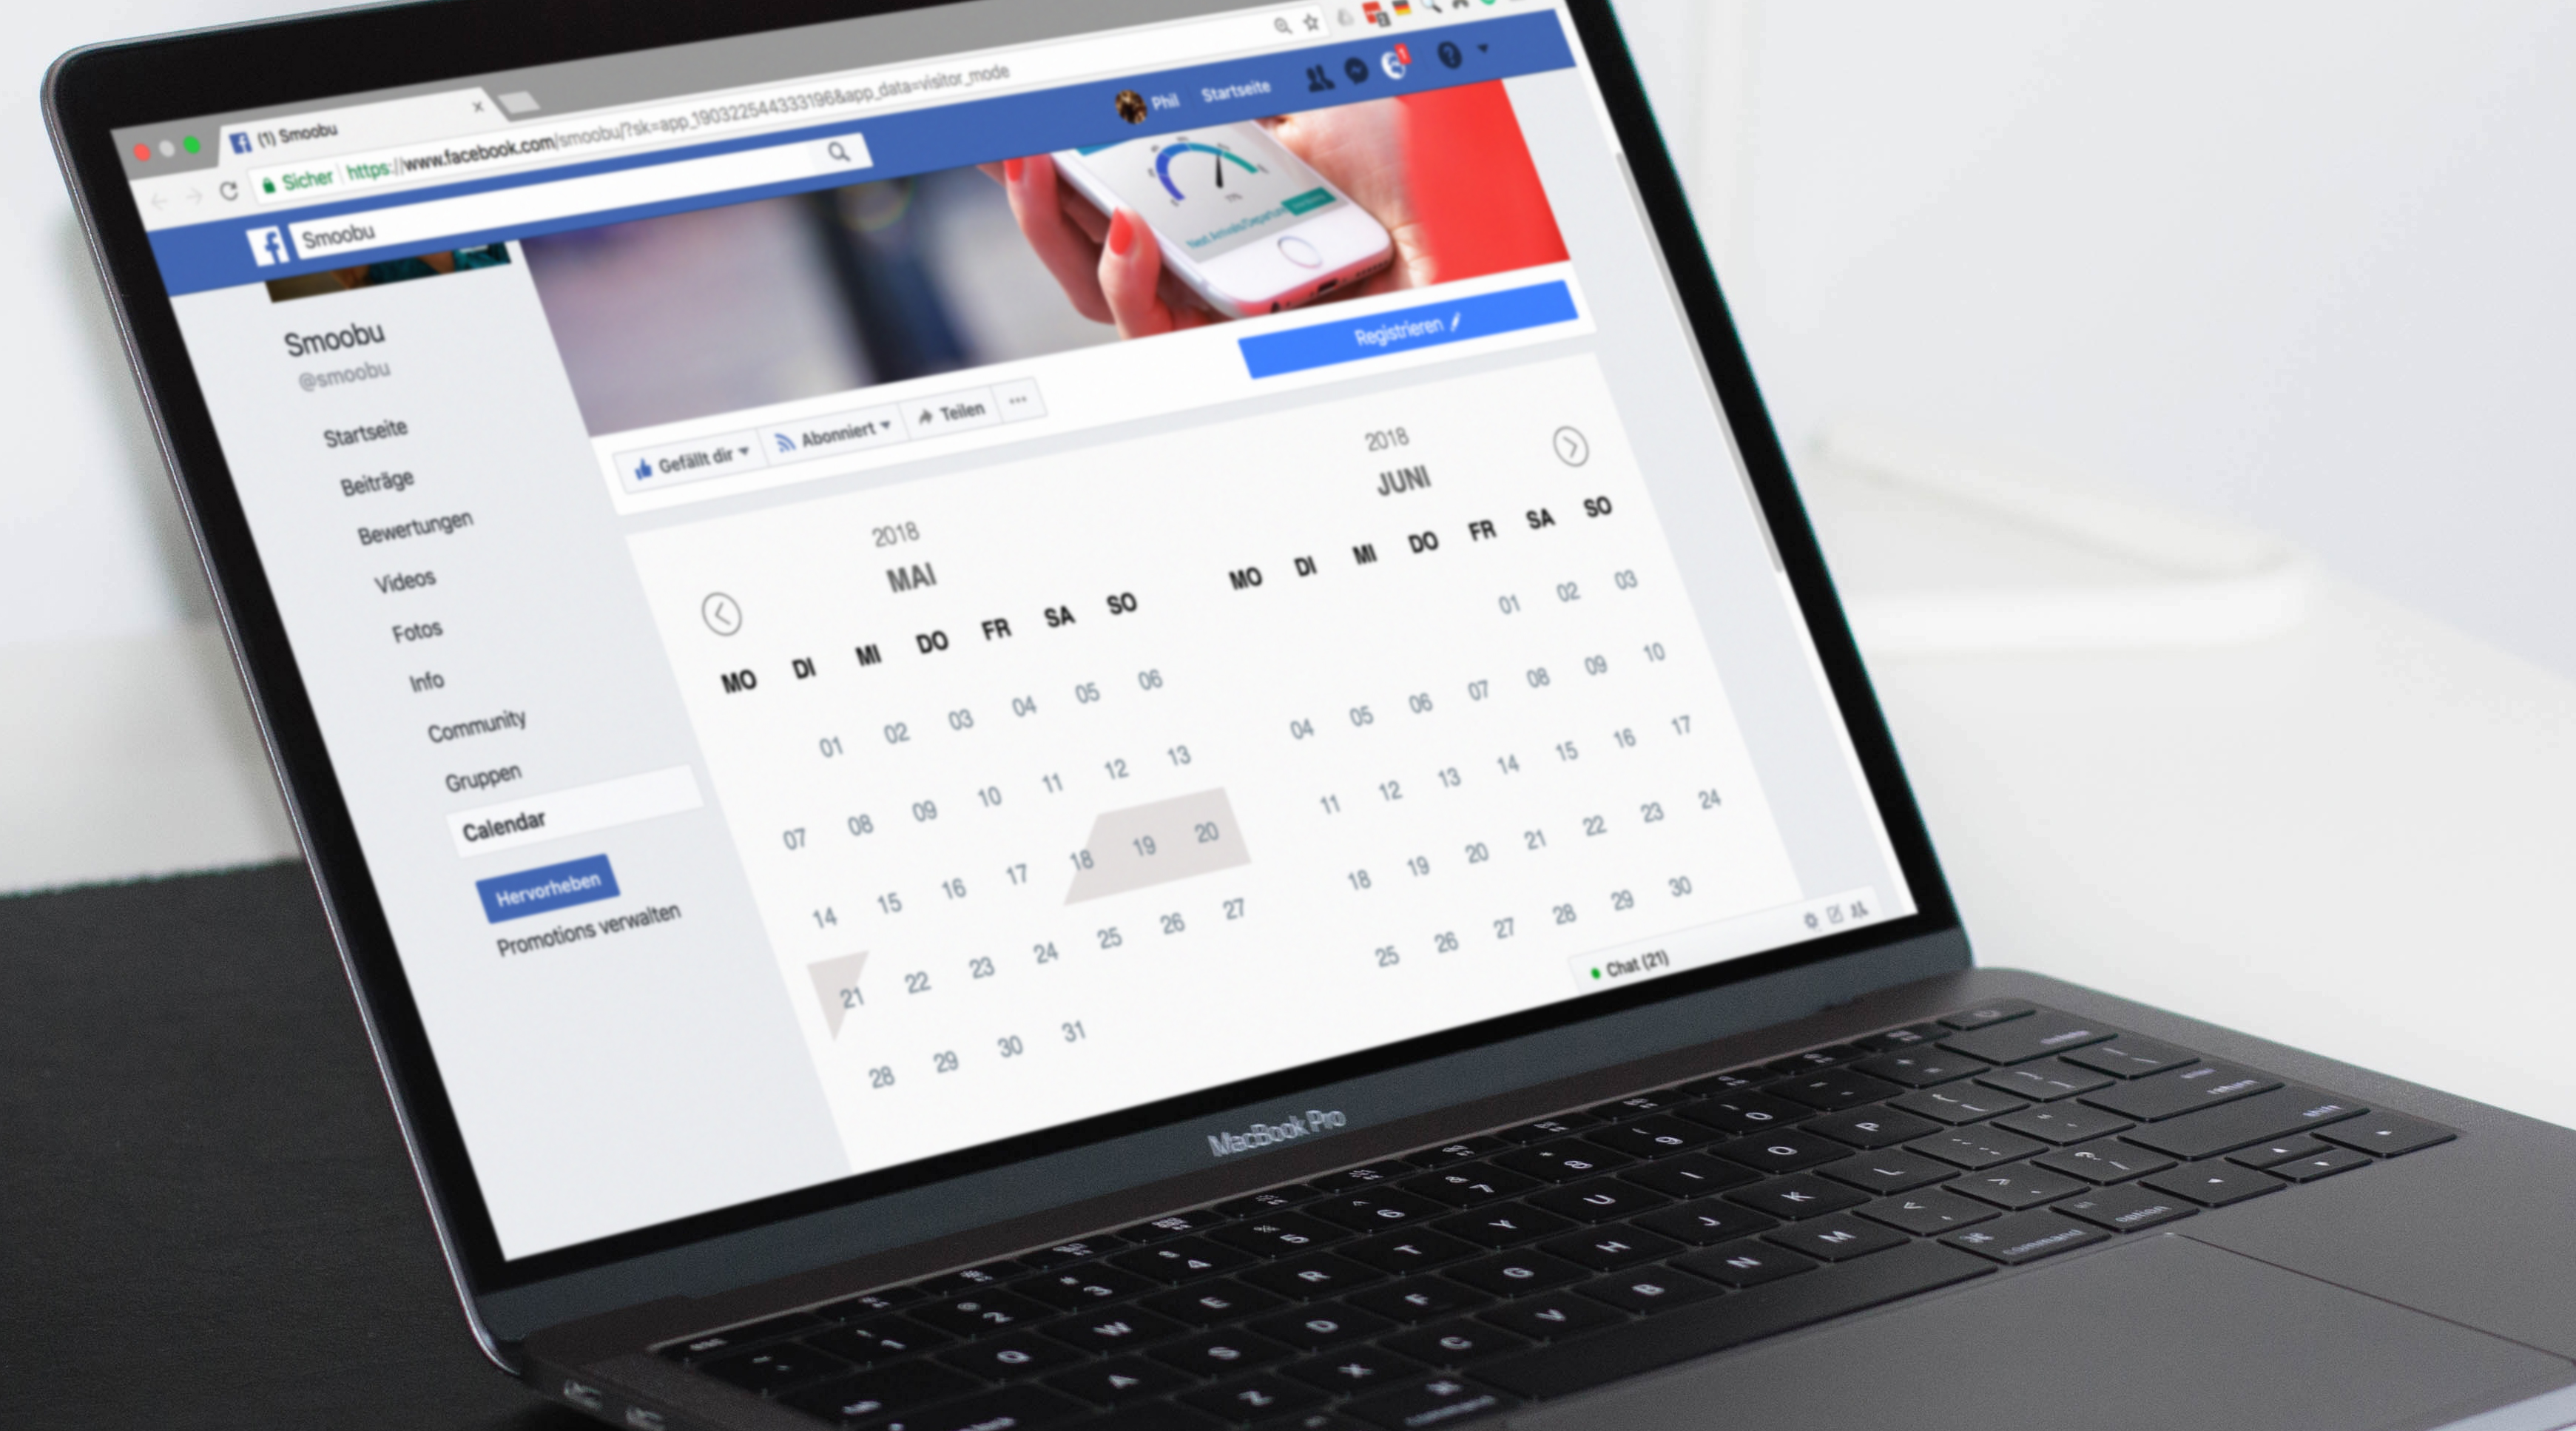 Facbook occupancy calendar, Integrate Smoobu calendar and booking tool on Facebook